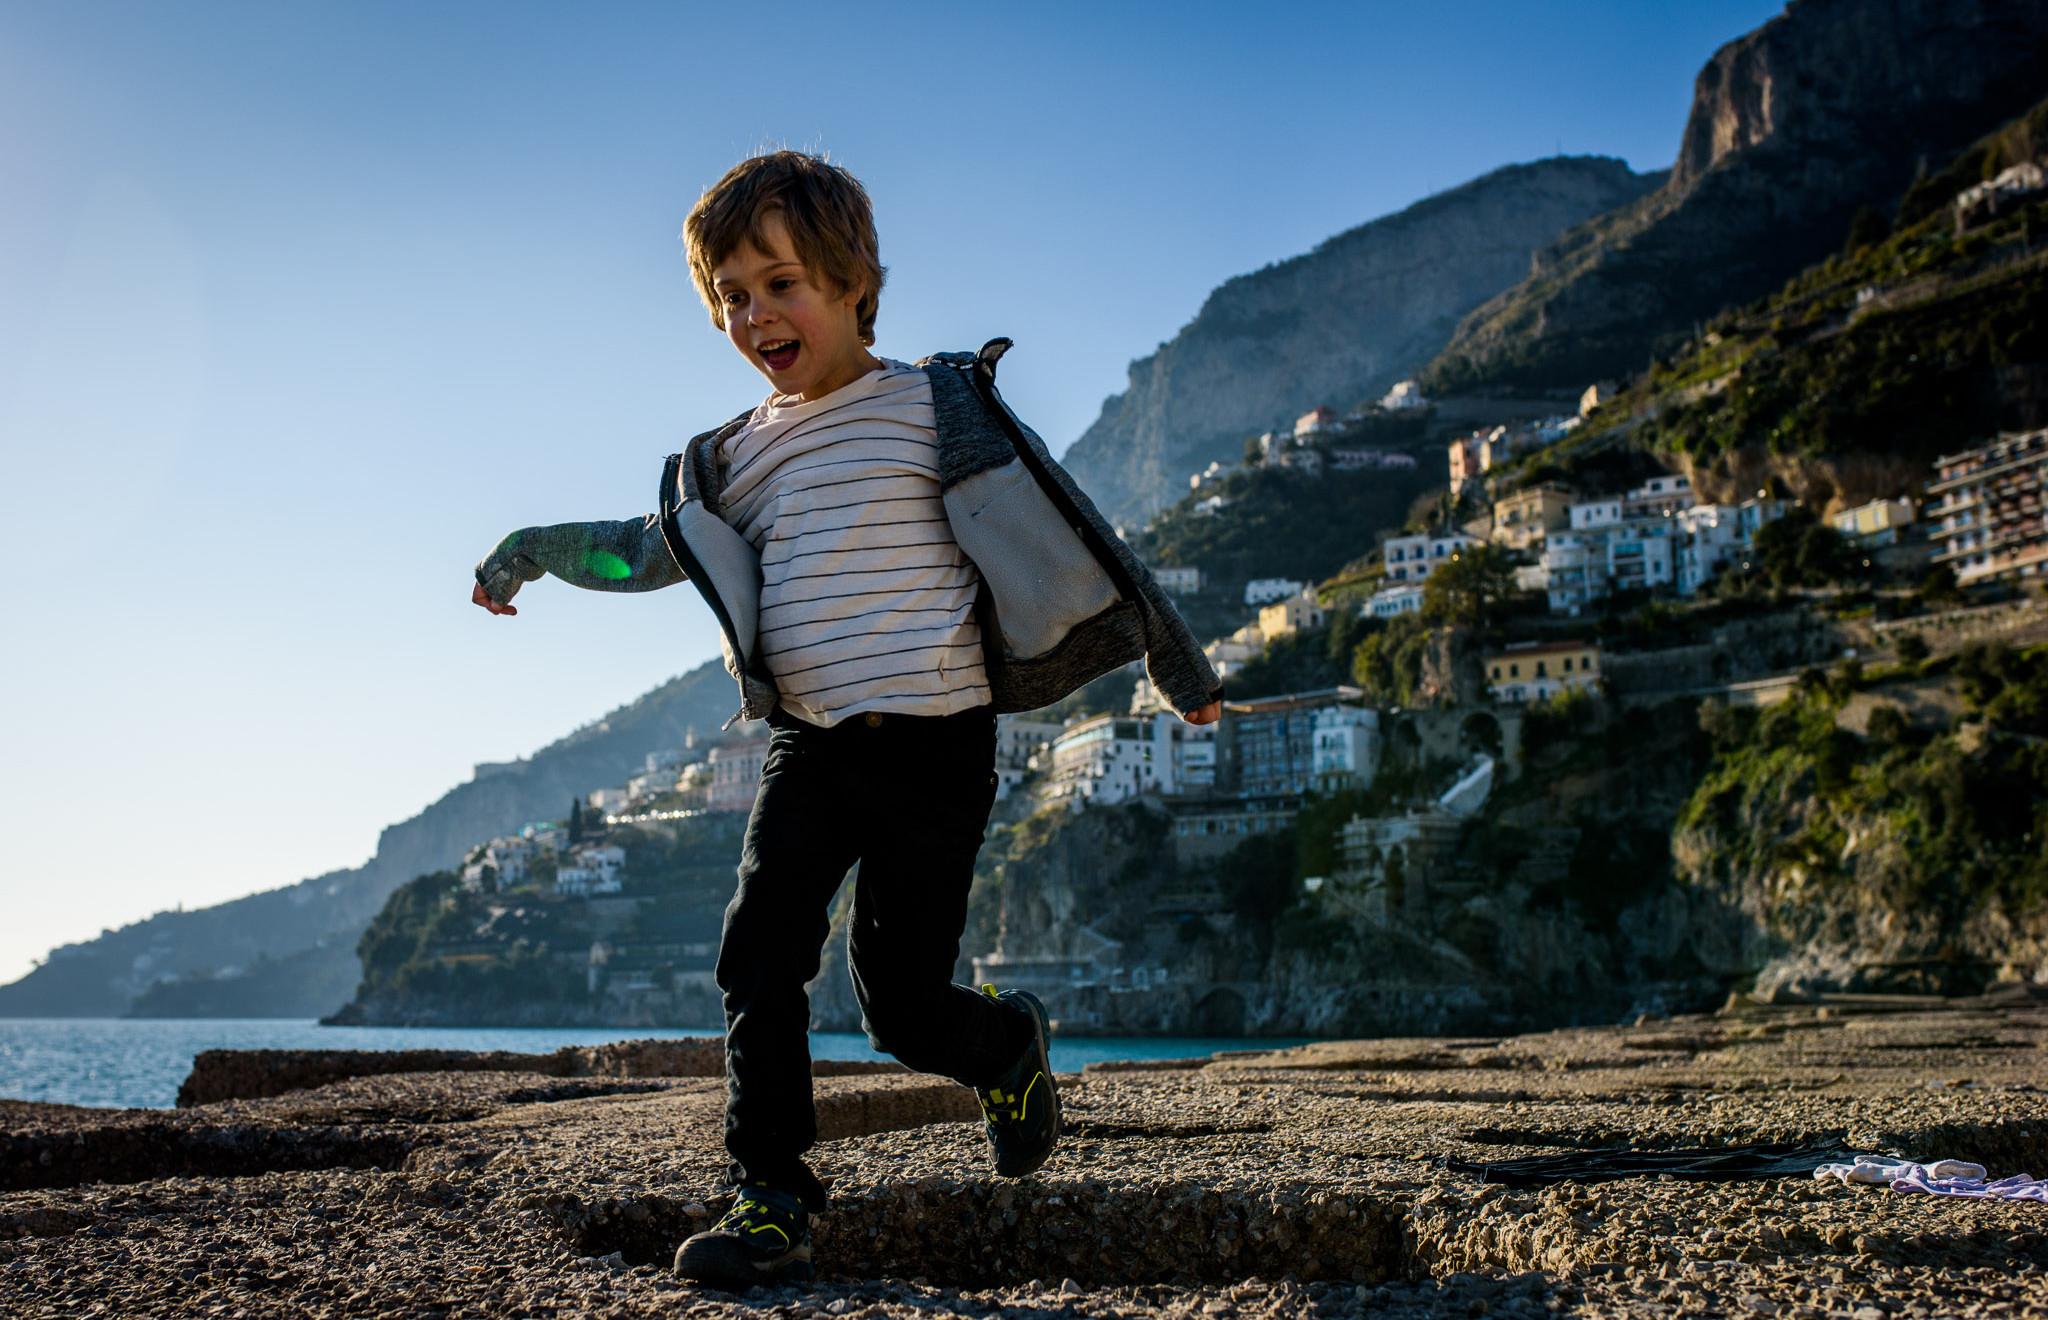 boy runs on the rocks along the coast